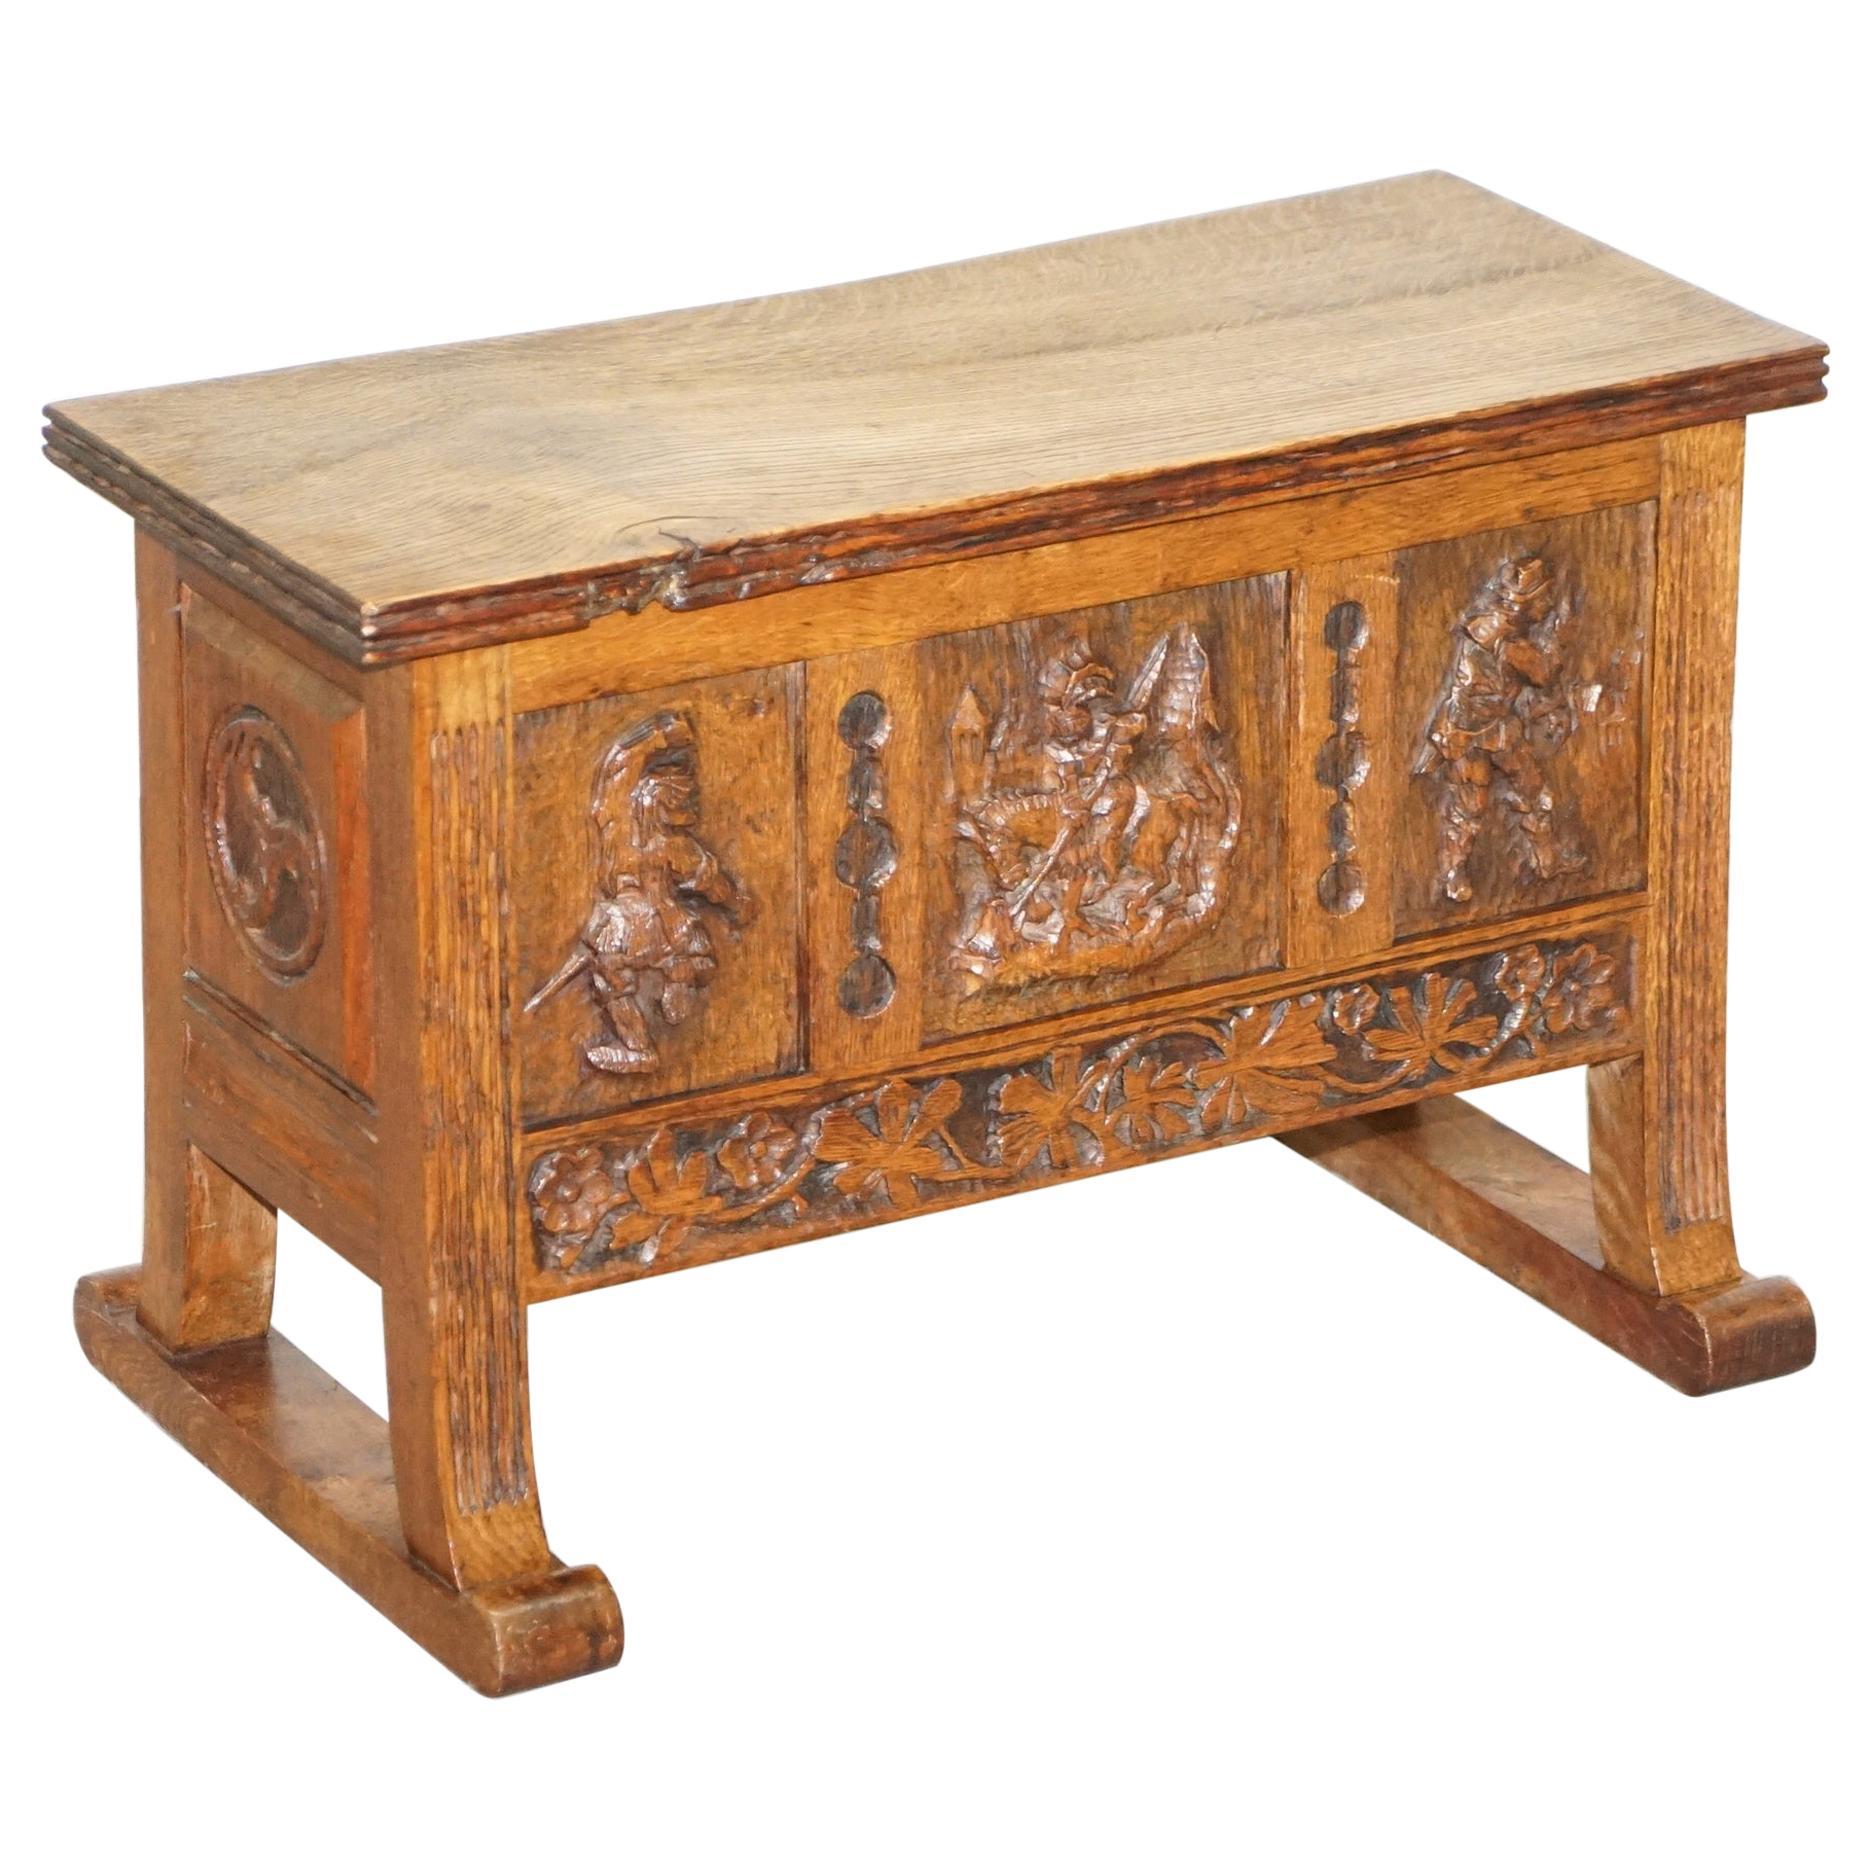 Stunning Hand Carved Oak Chest, Bench, Trunk circa 1840 Danish Internal Storage